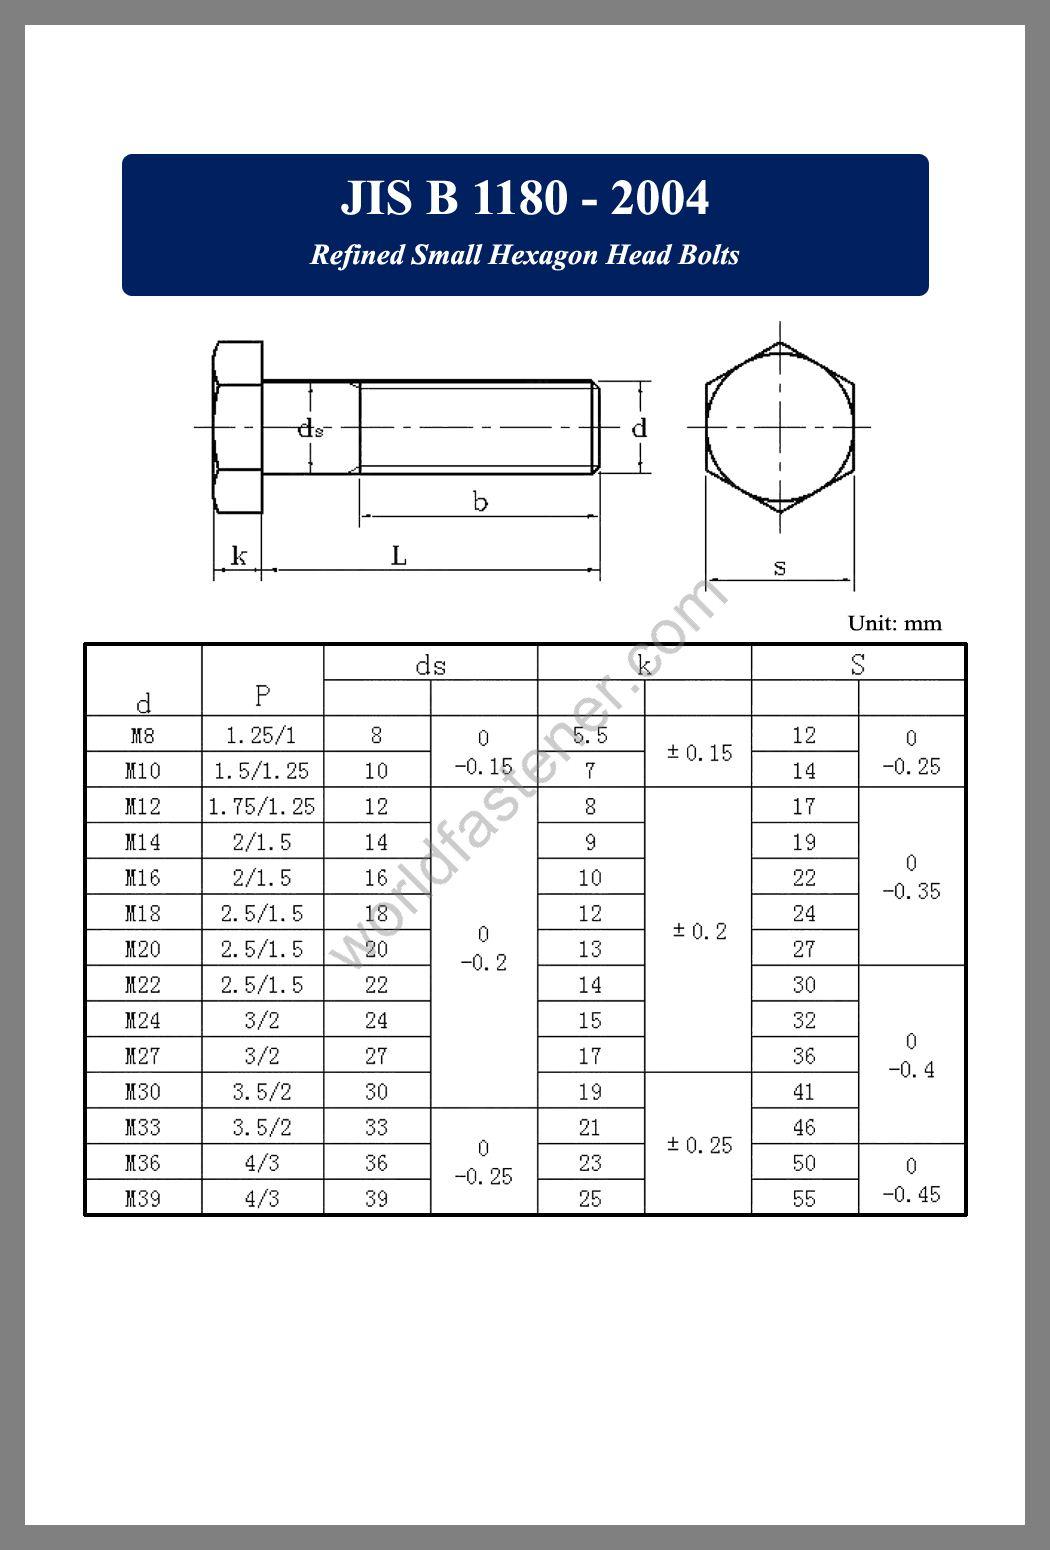 JIS B 1180, JIS B1180 Refined Small Hexagon Head Bolts, fastener, screw, bolt, JIS bolt, JIS fastener